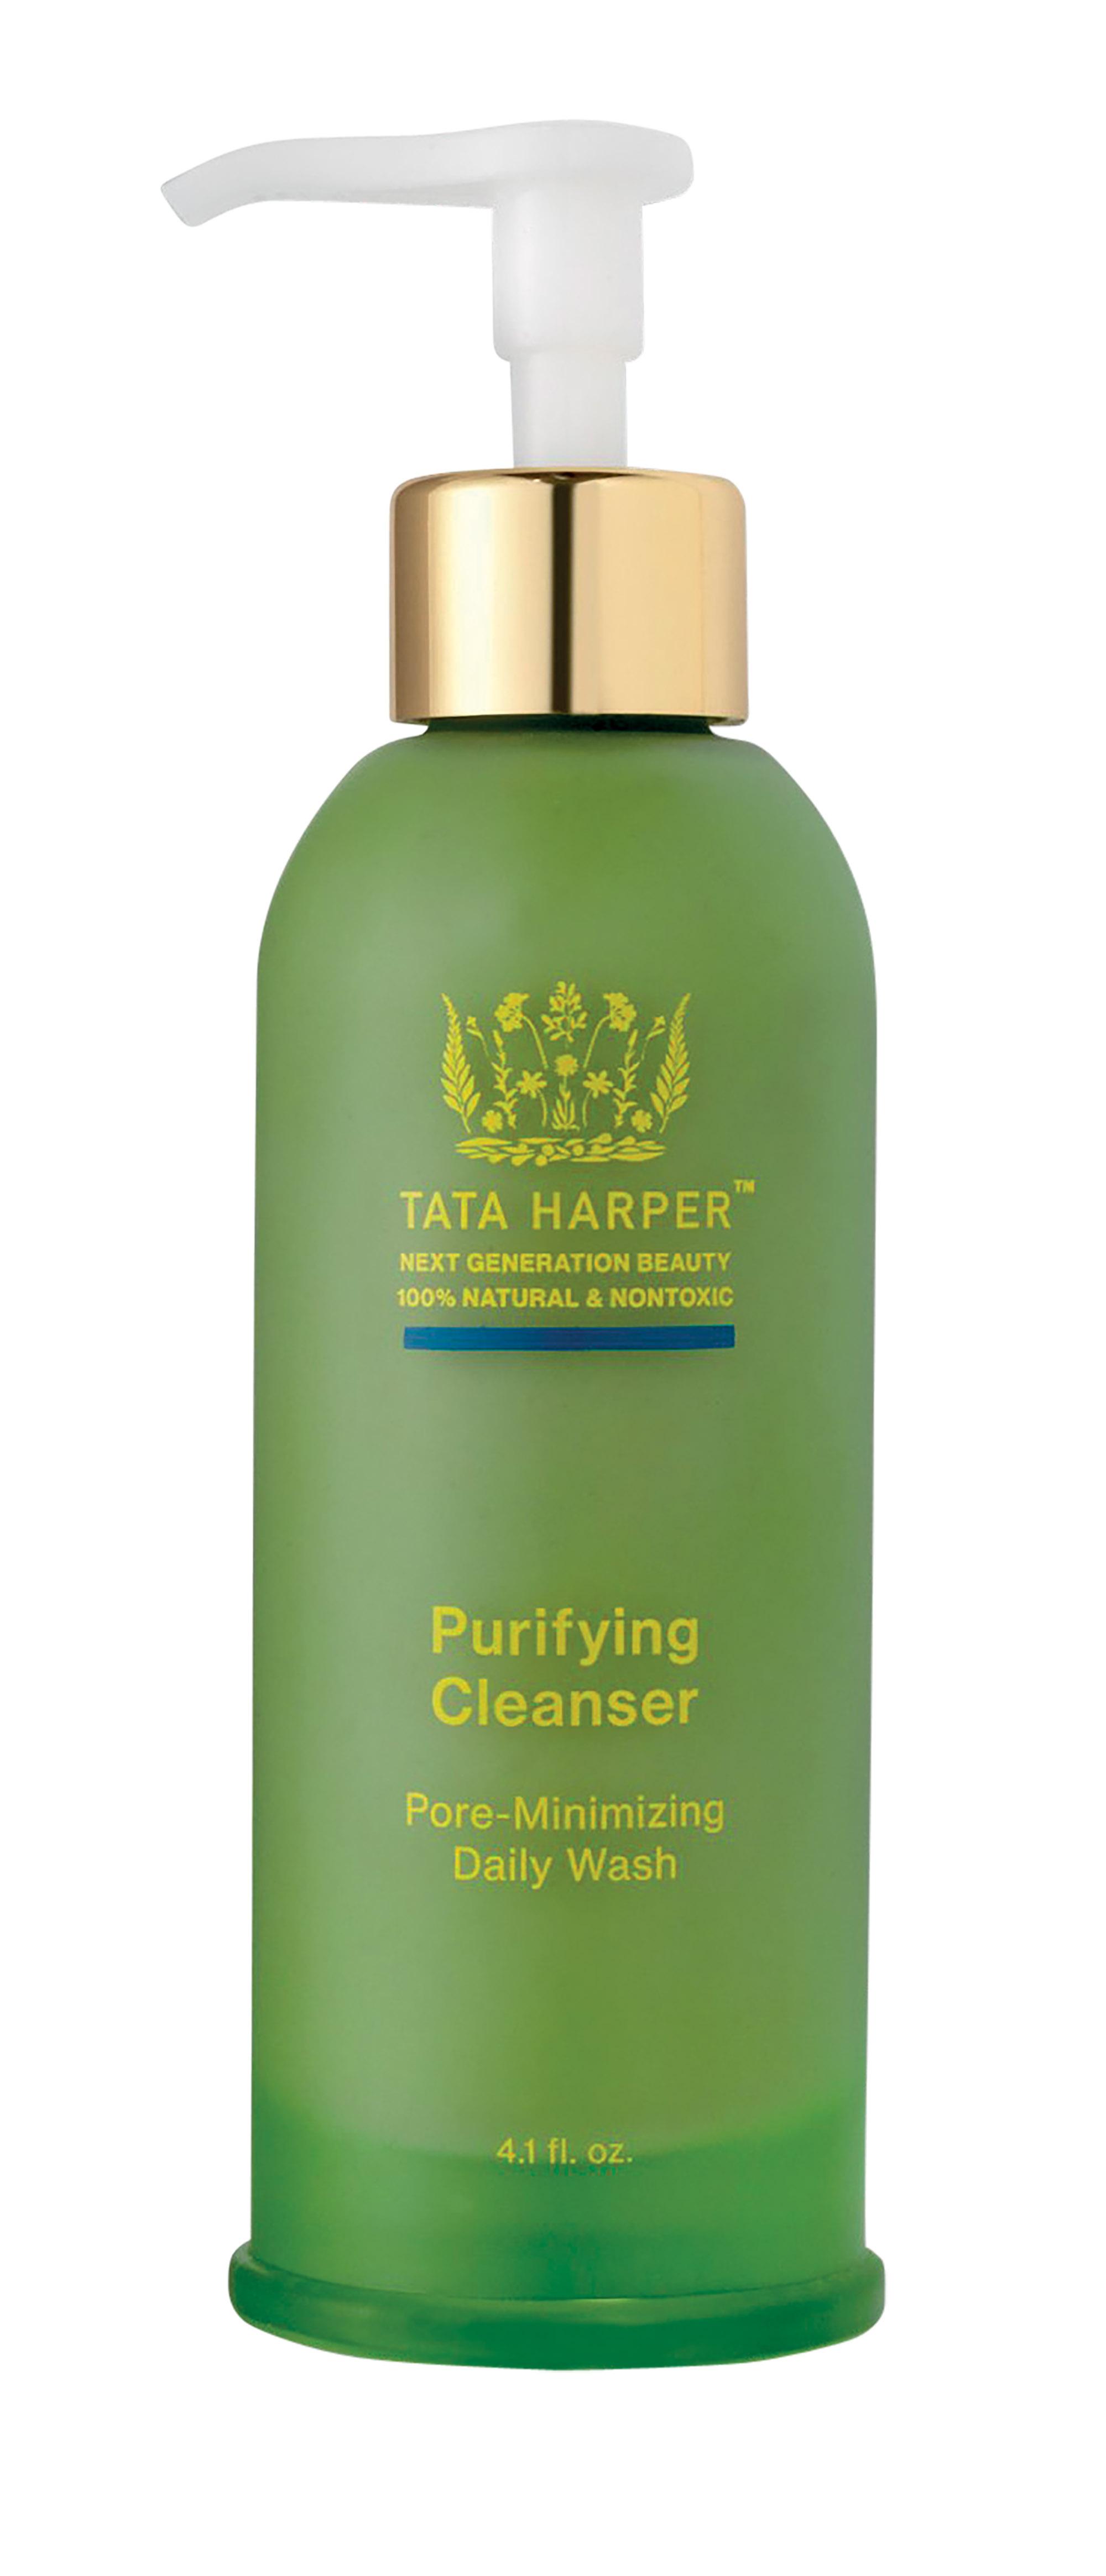 mỹ phẩm thuần chay sữa rửa mặt Tata Harper